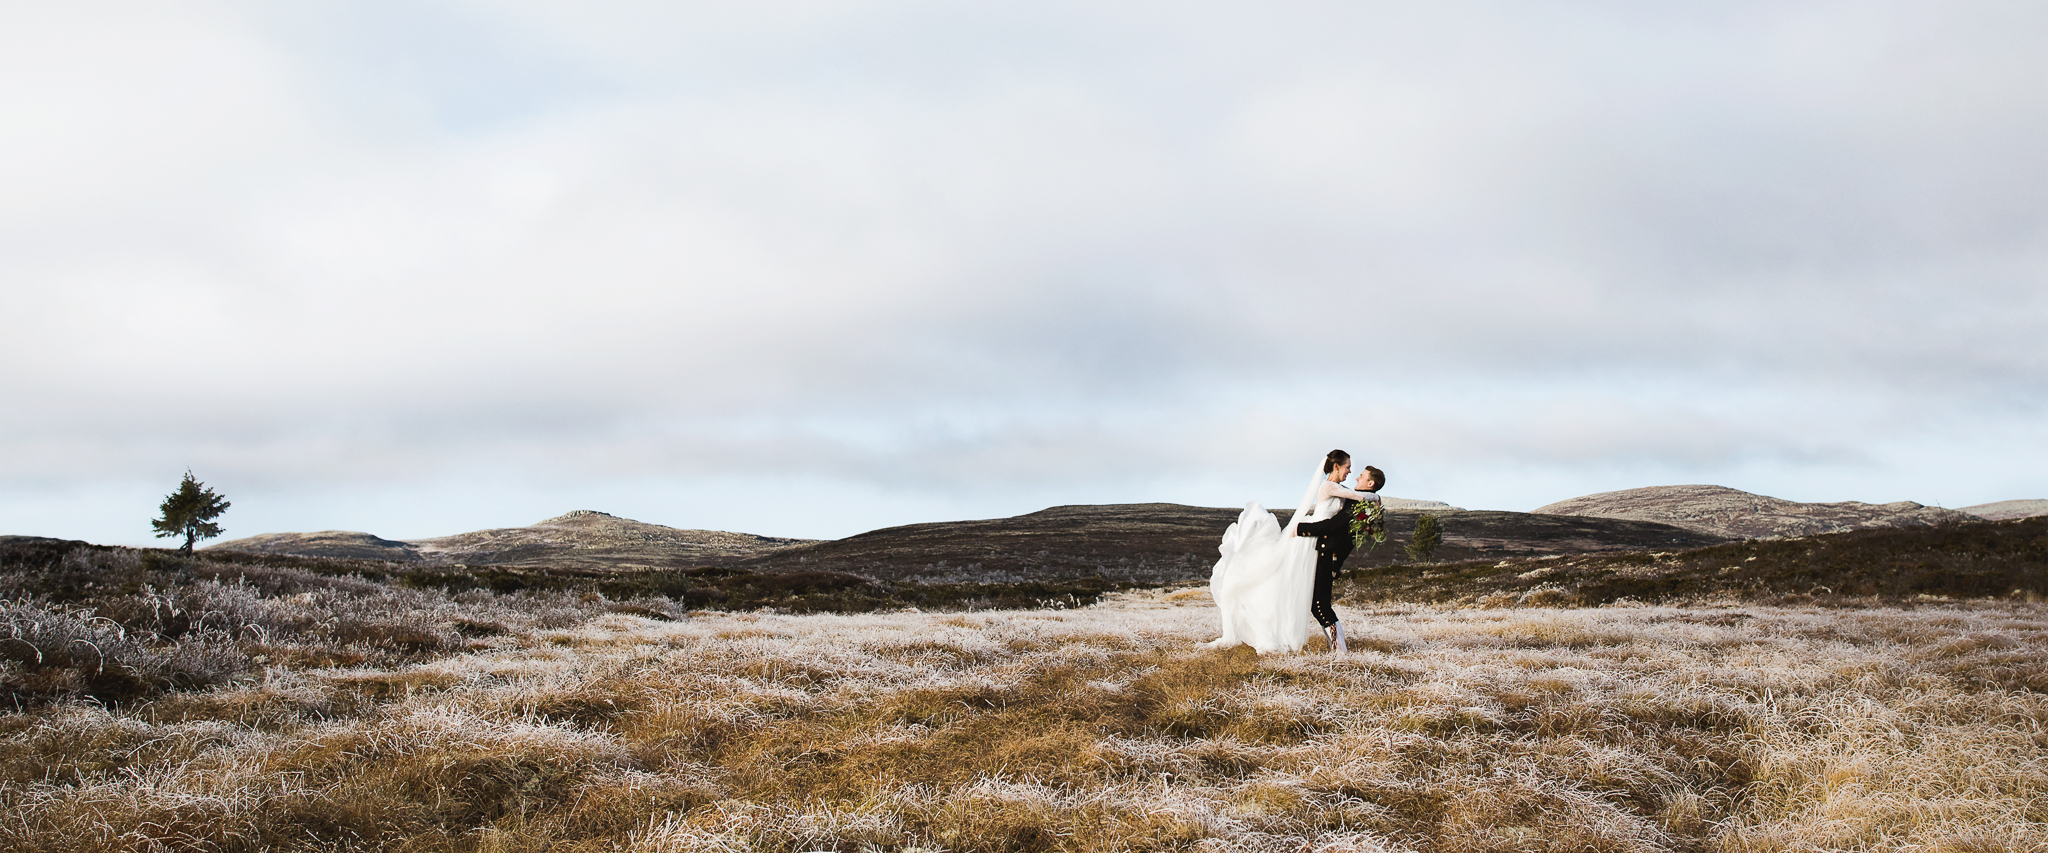 Bryllup - Gitte